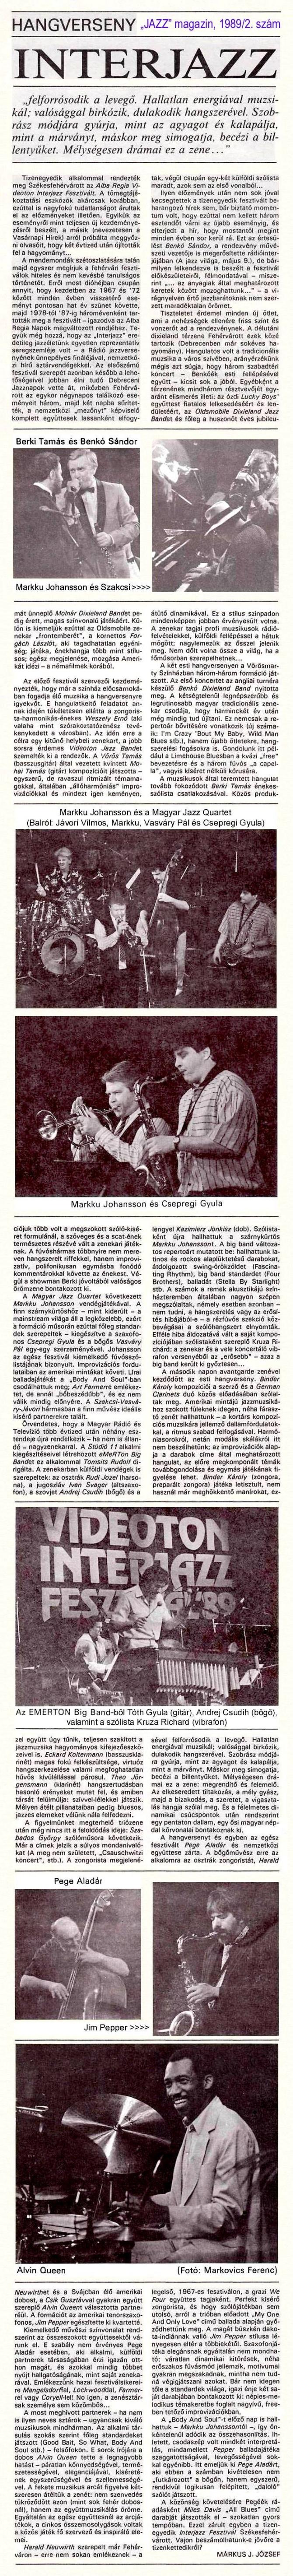 cikk-jazz-89-2.jpg